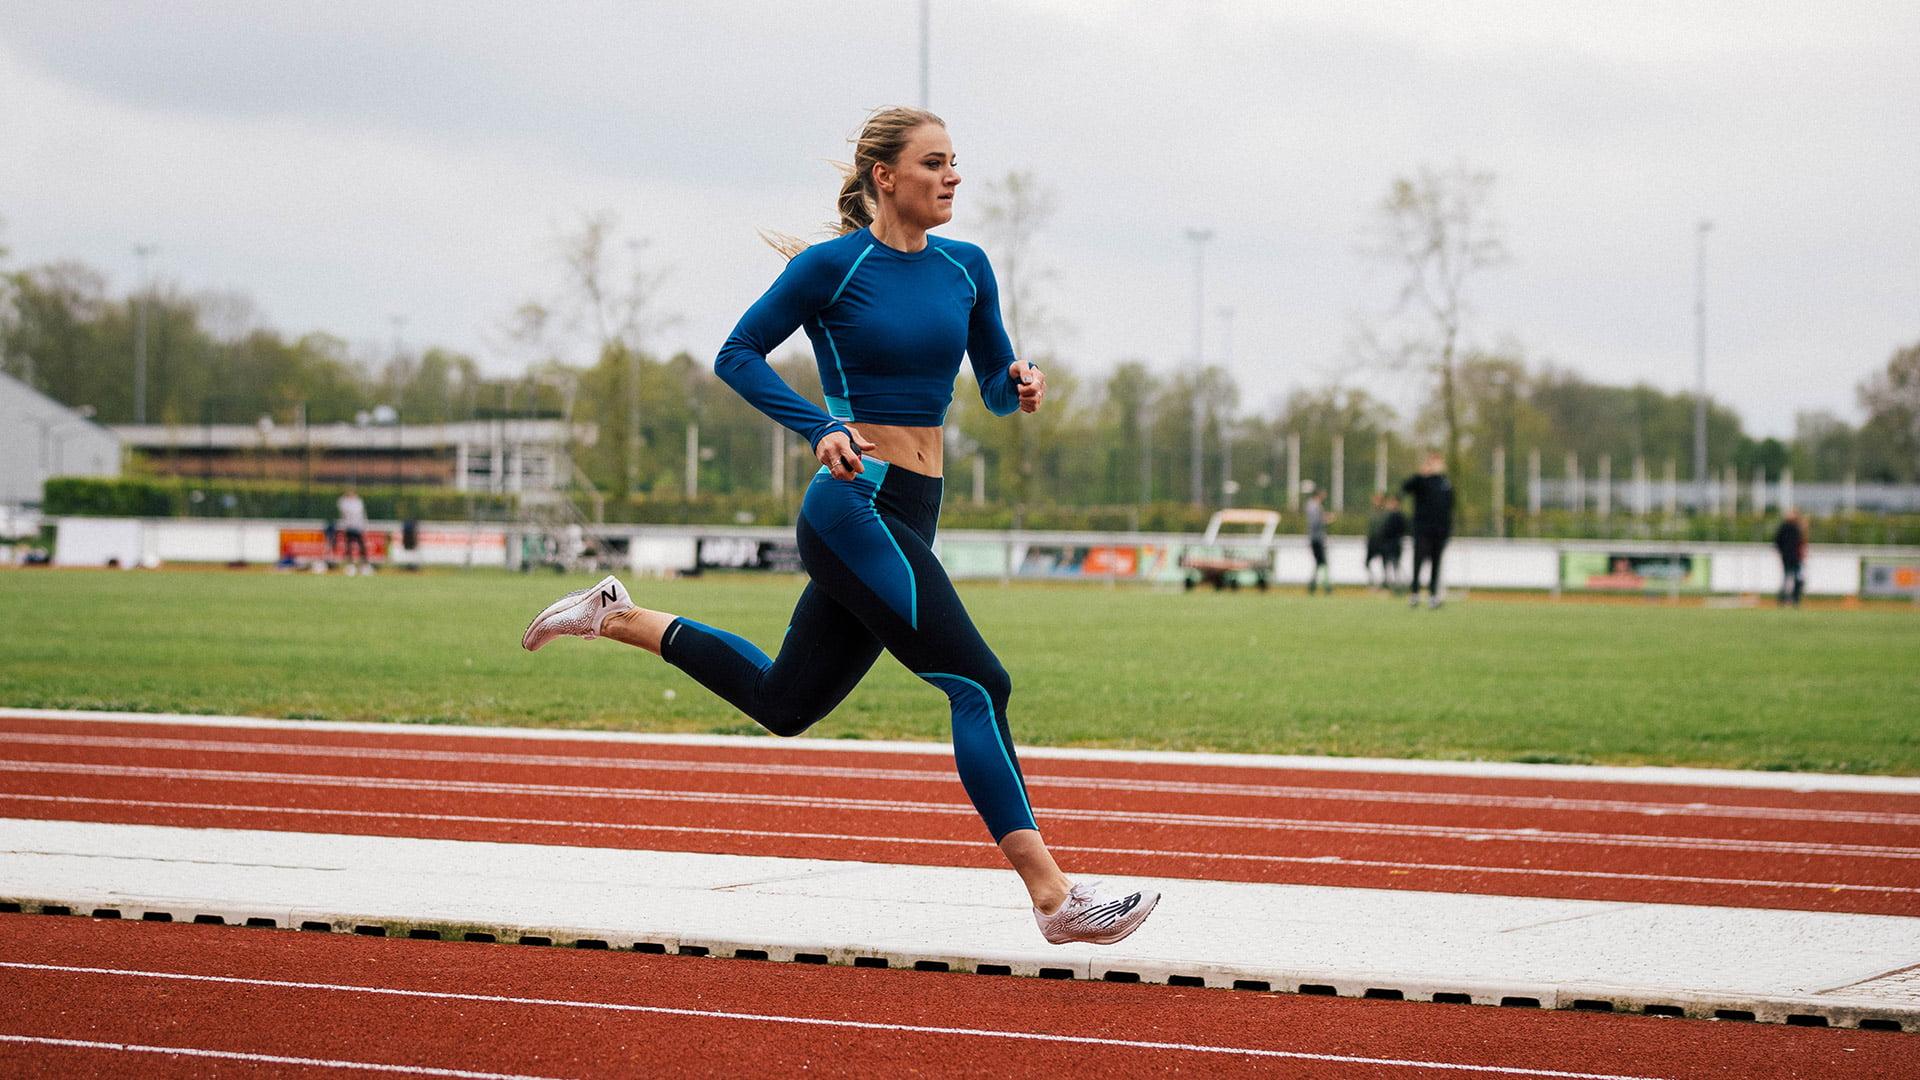 2021 - Lisanne de Witte - Virtuoos